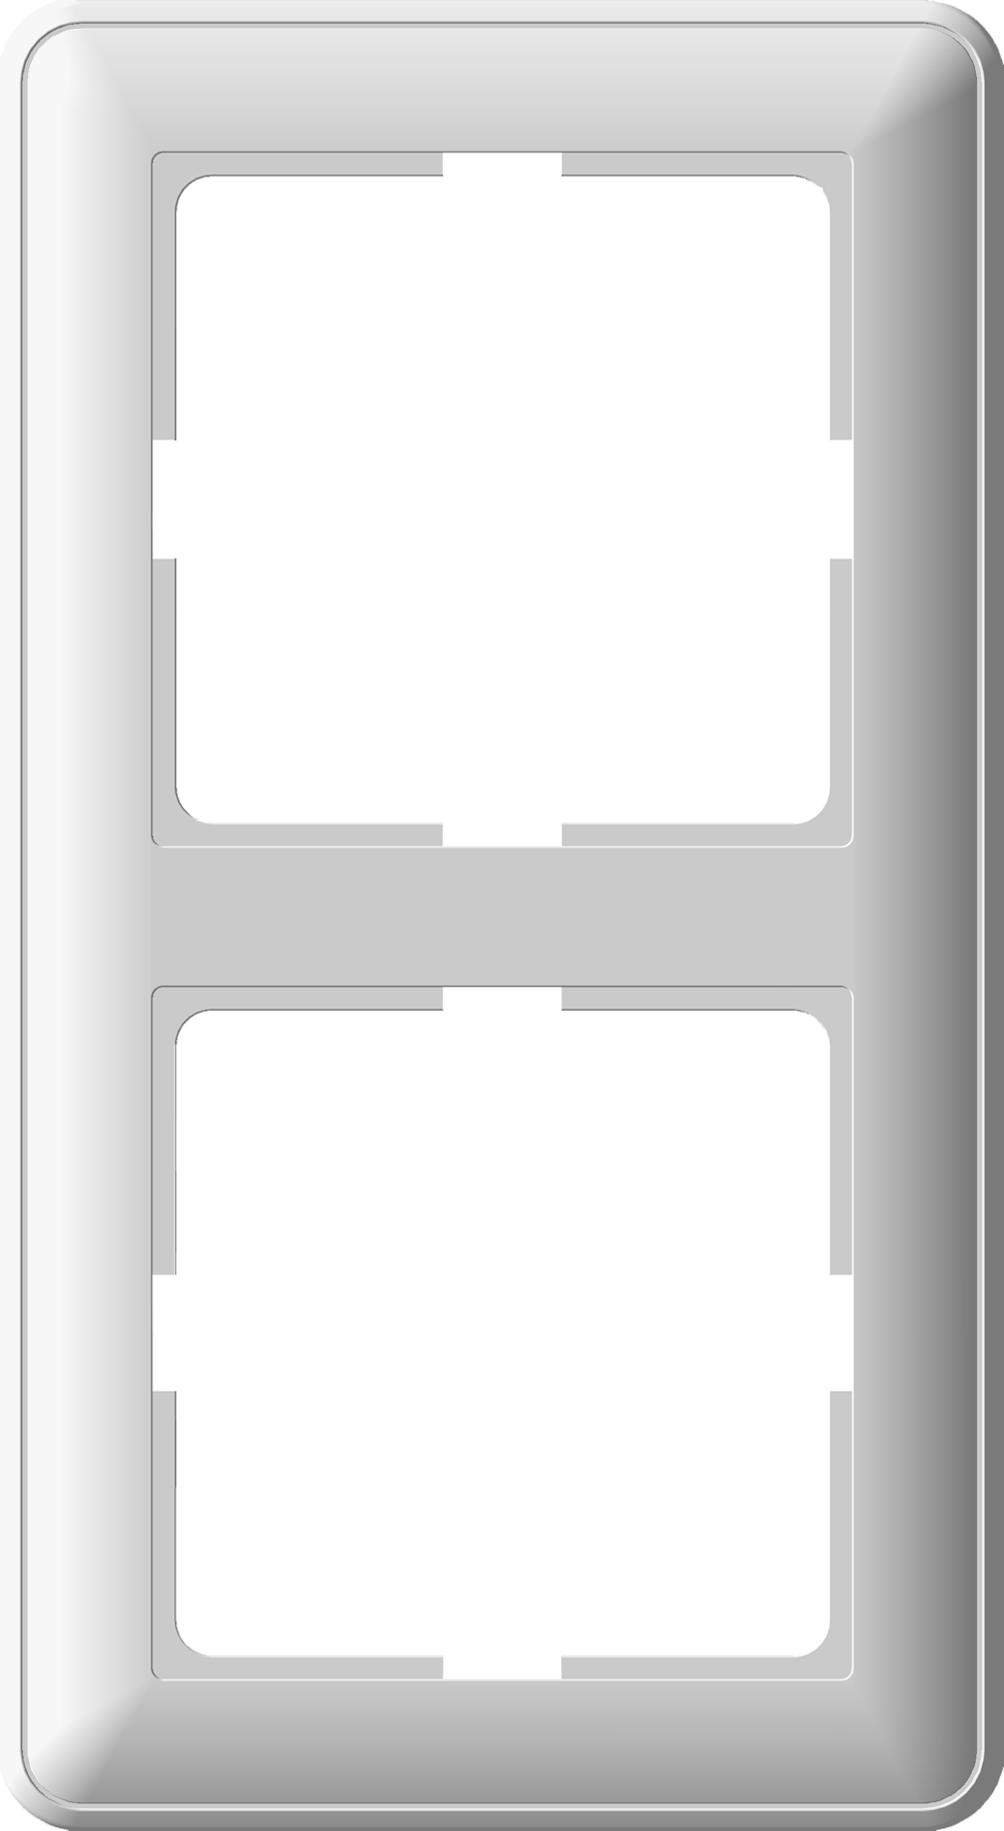 Image Description for https://tedi.itc-electronics.com/itcmedia/images/20190426/KD218_SCHNEIDERELECTRIC_2.jpg